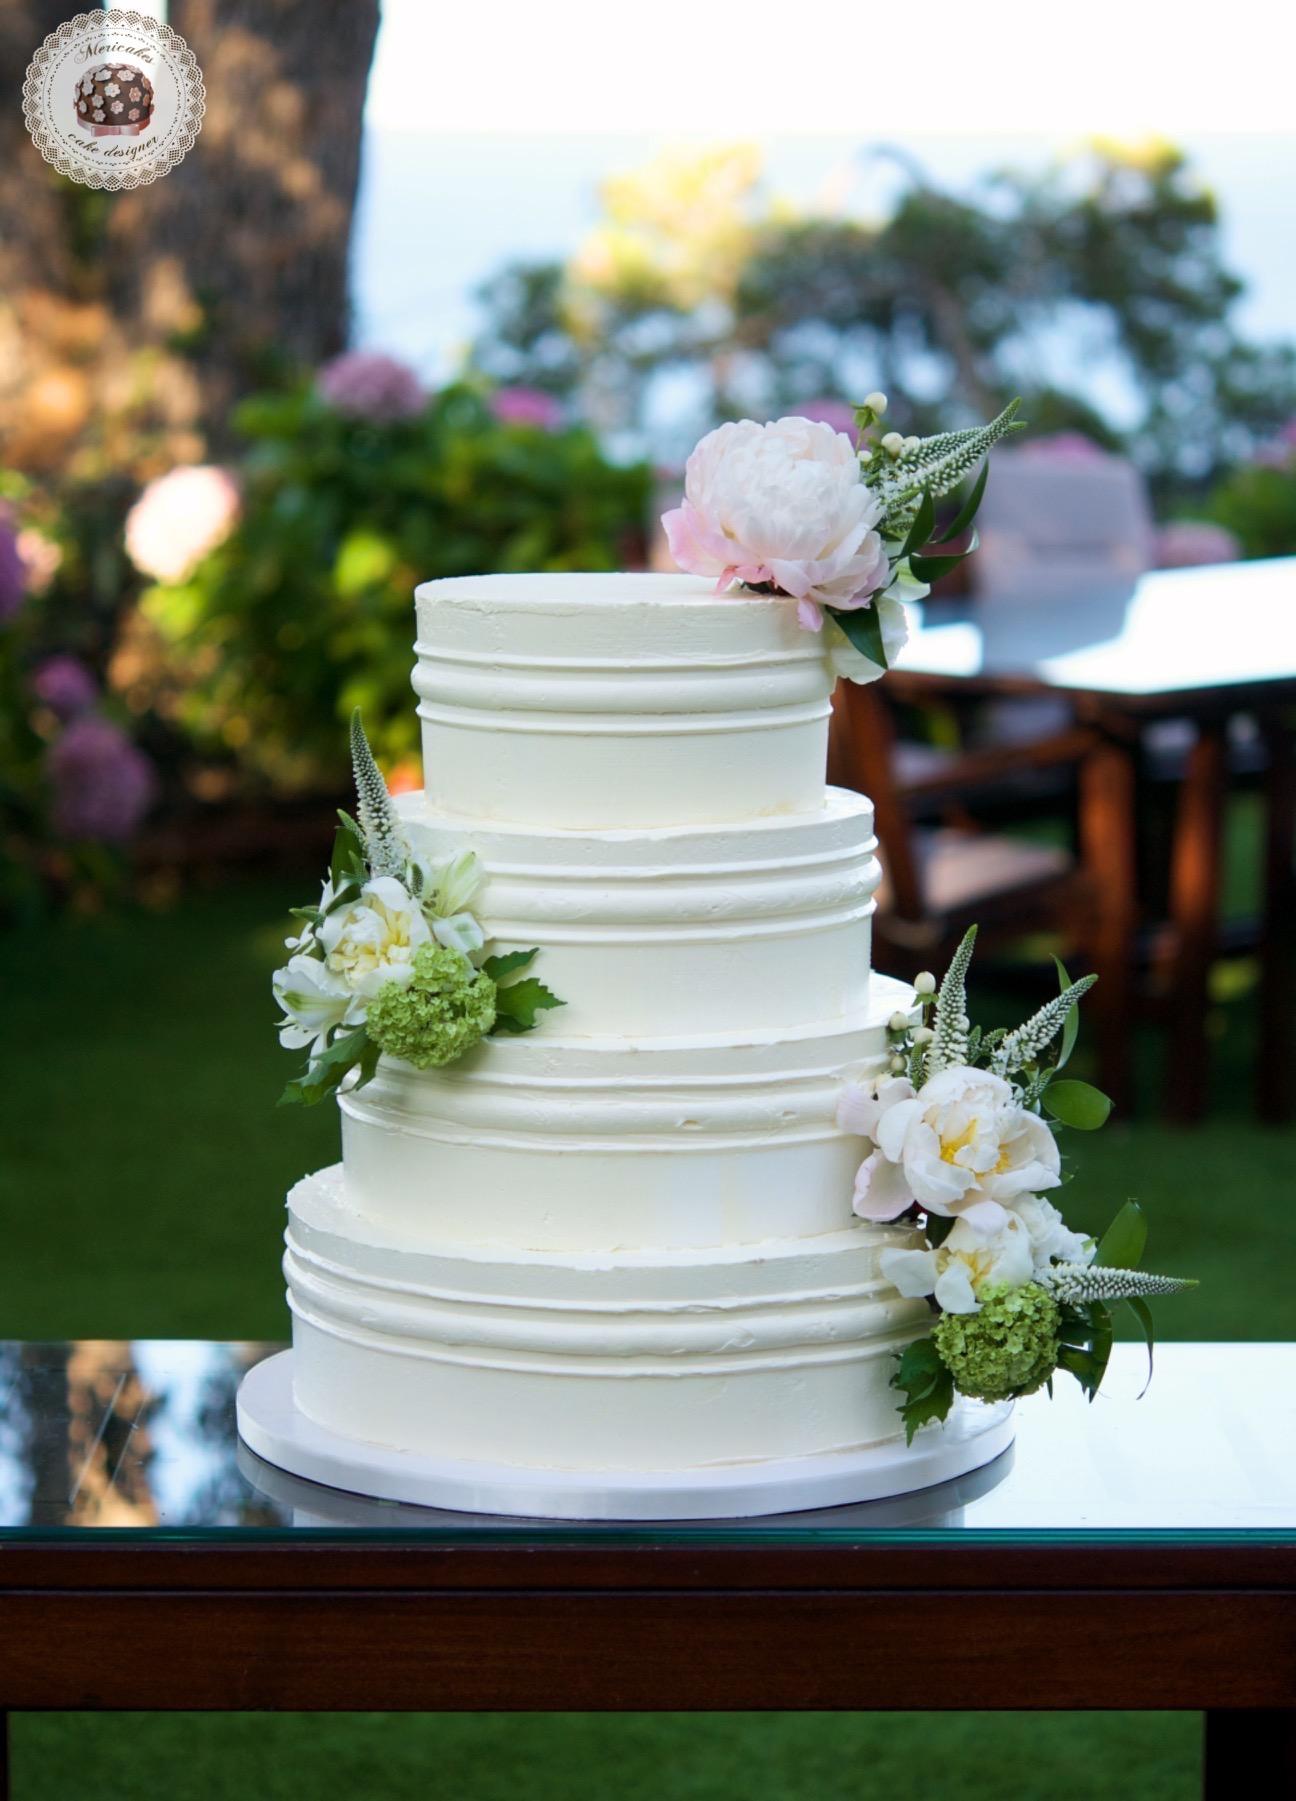 Cream cake, wedding cake, tarta de boda, swiss buttercream, mericakes, convent de blanes, mediterranean sea, flowers cake, red velvet, spain wedding, peony 1